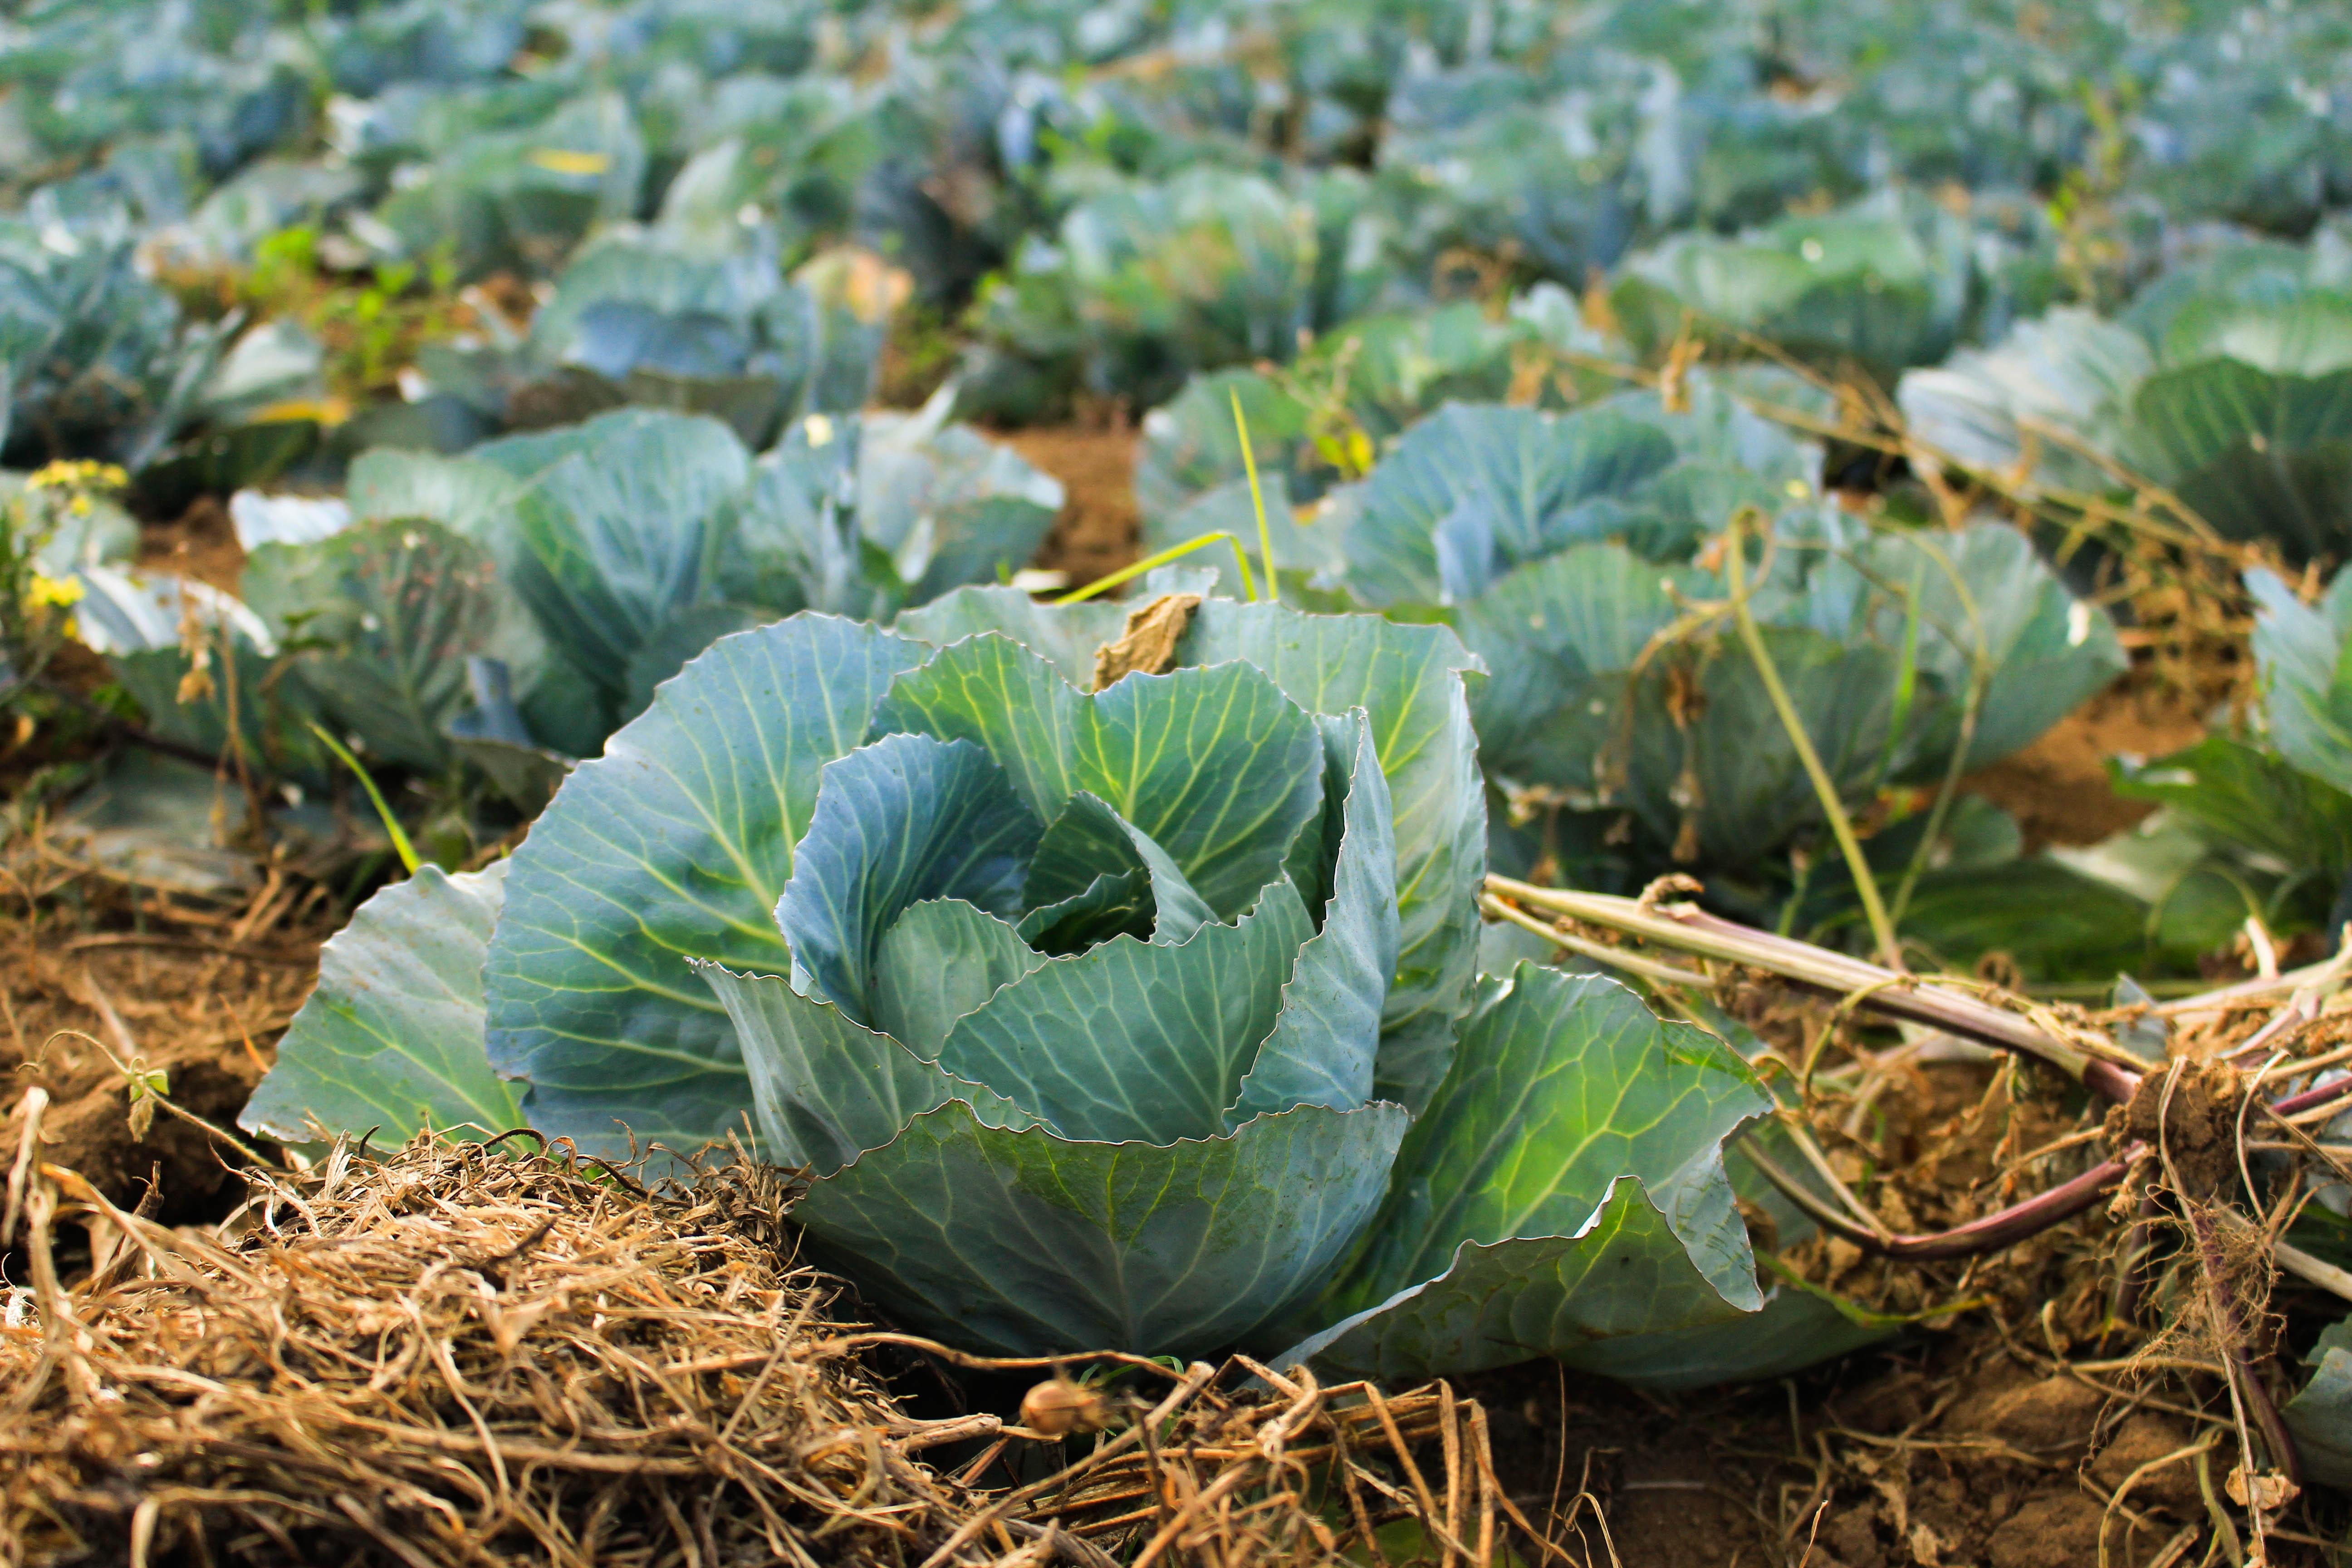 Fotos gratis : planta, granja, flor, comida, Produce ...